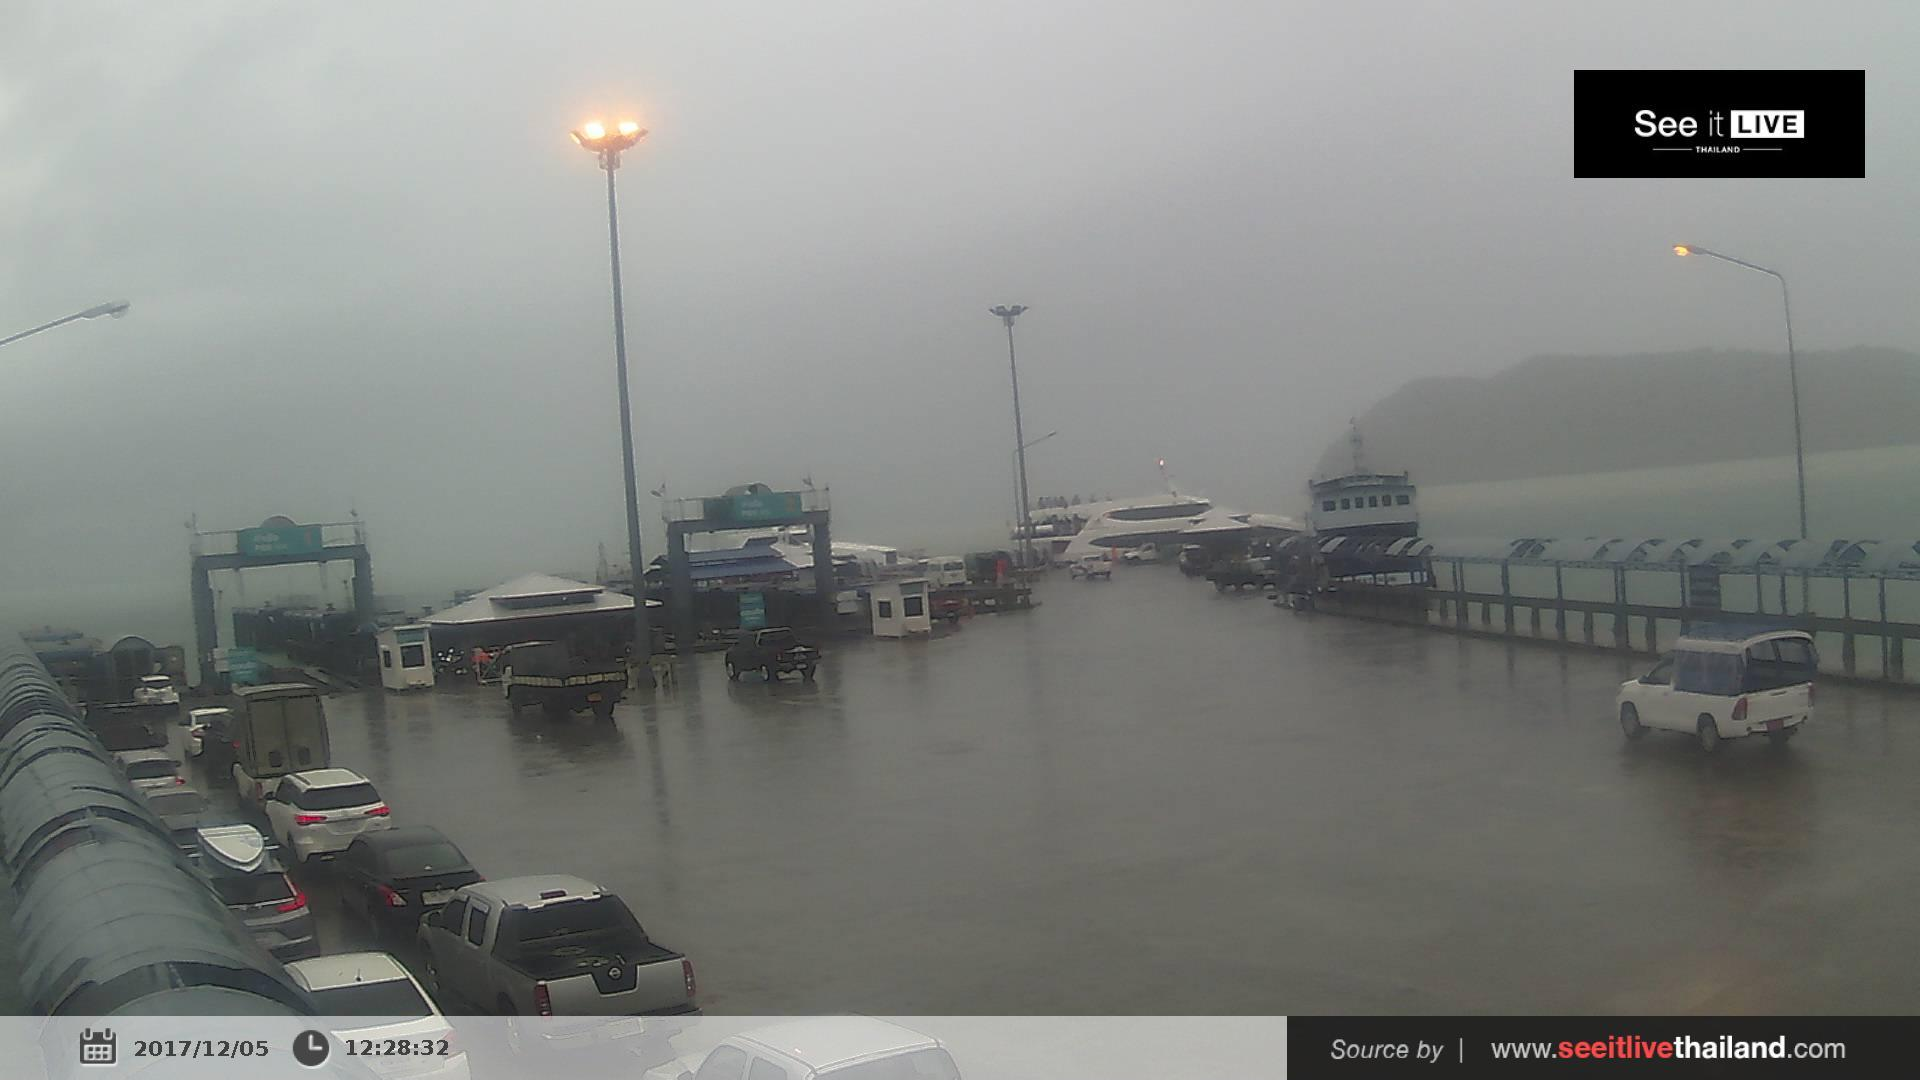 Веб-камера บ้านในวก: Phangan Pier